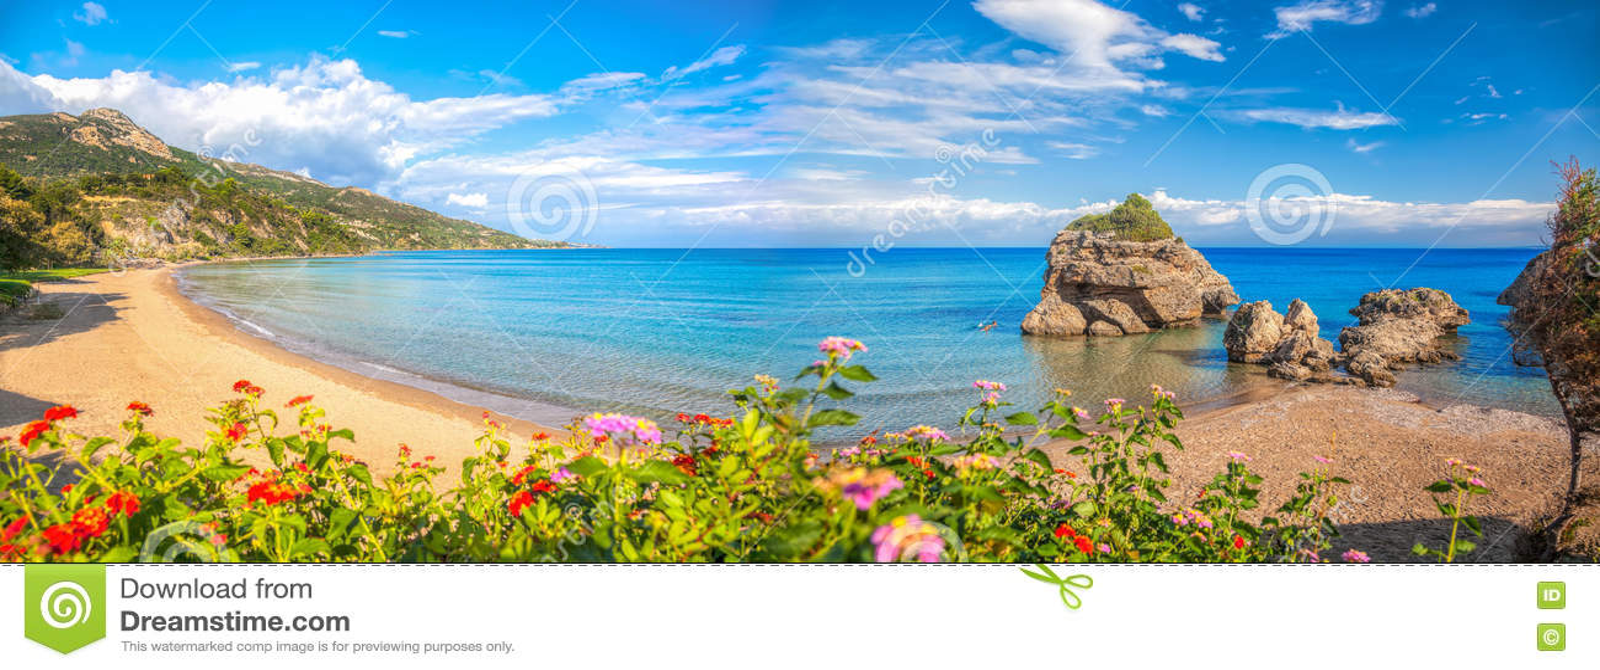 Панорама пляжа Порту Zorro против красочных цветков на острове Закинфа, Греции